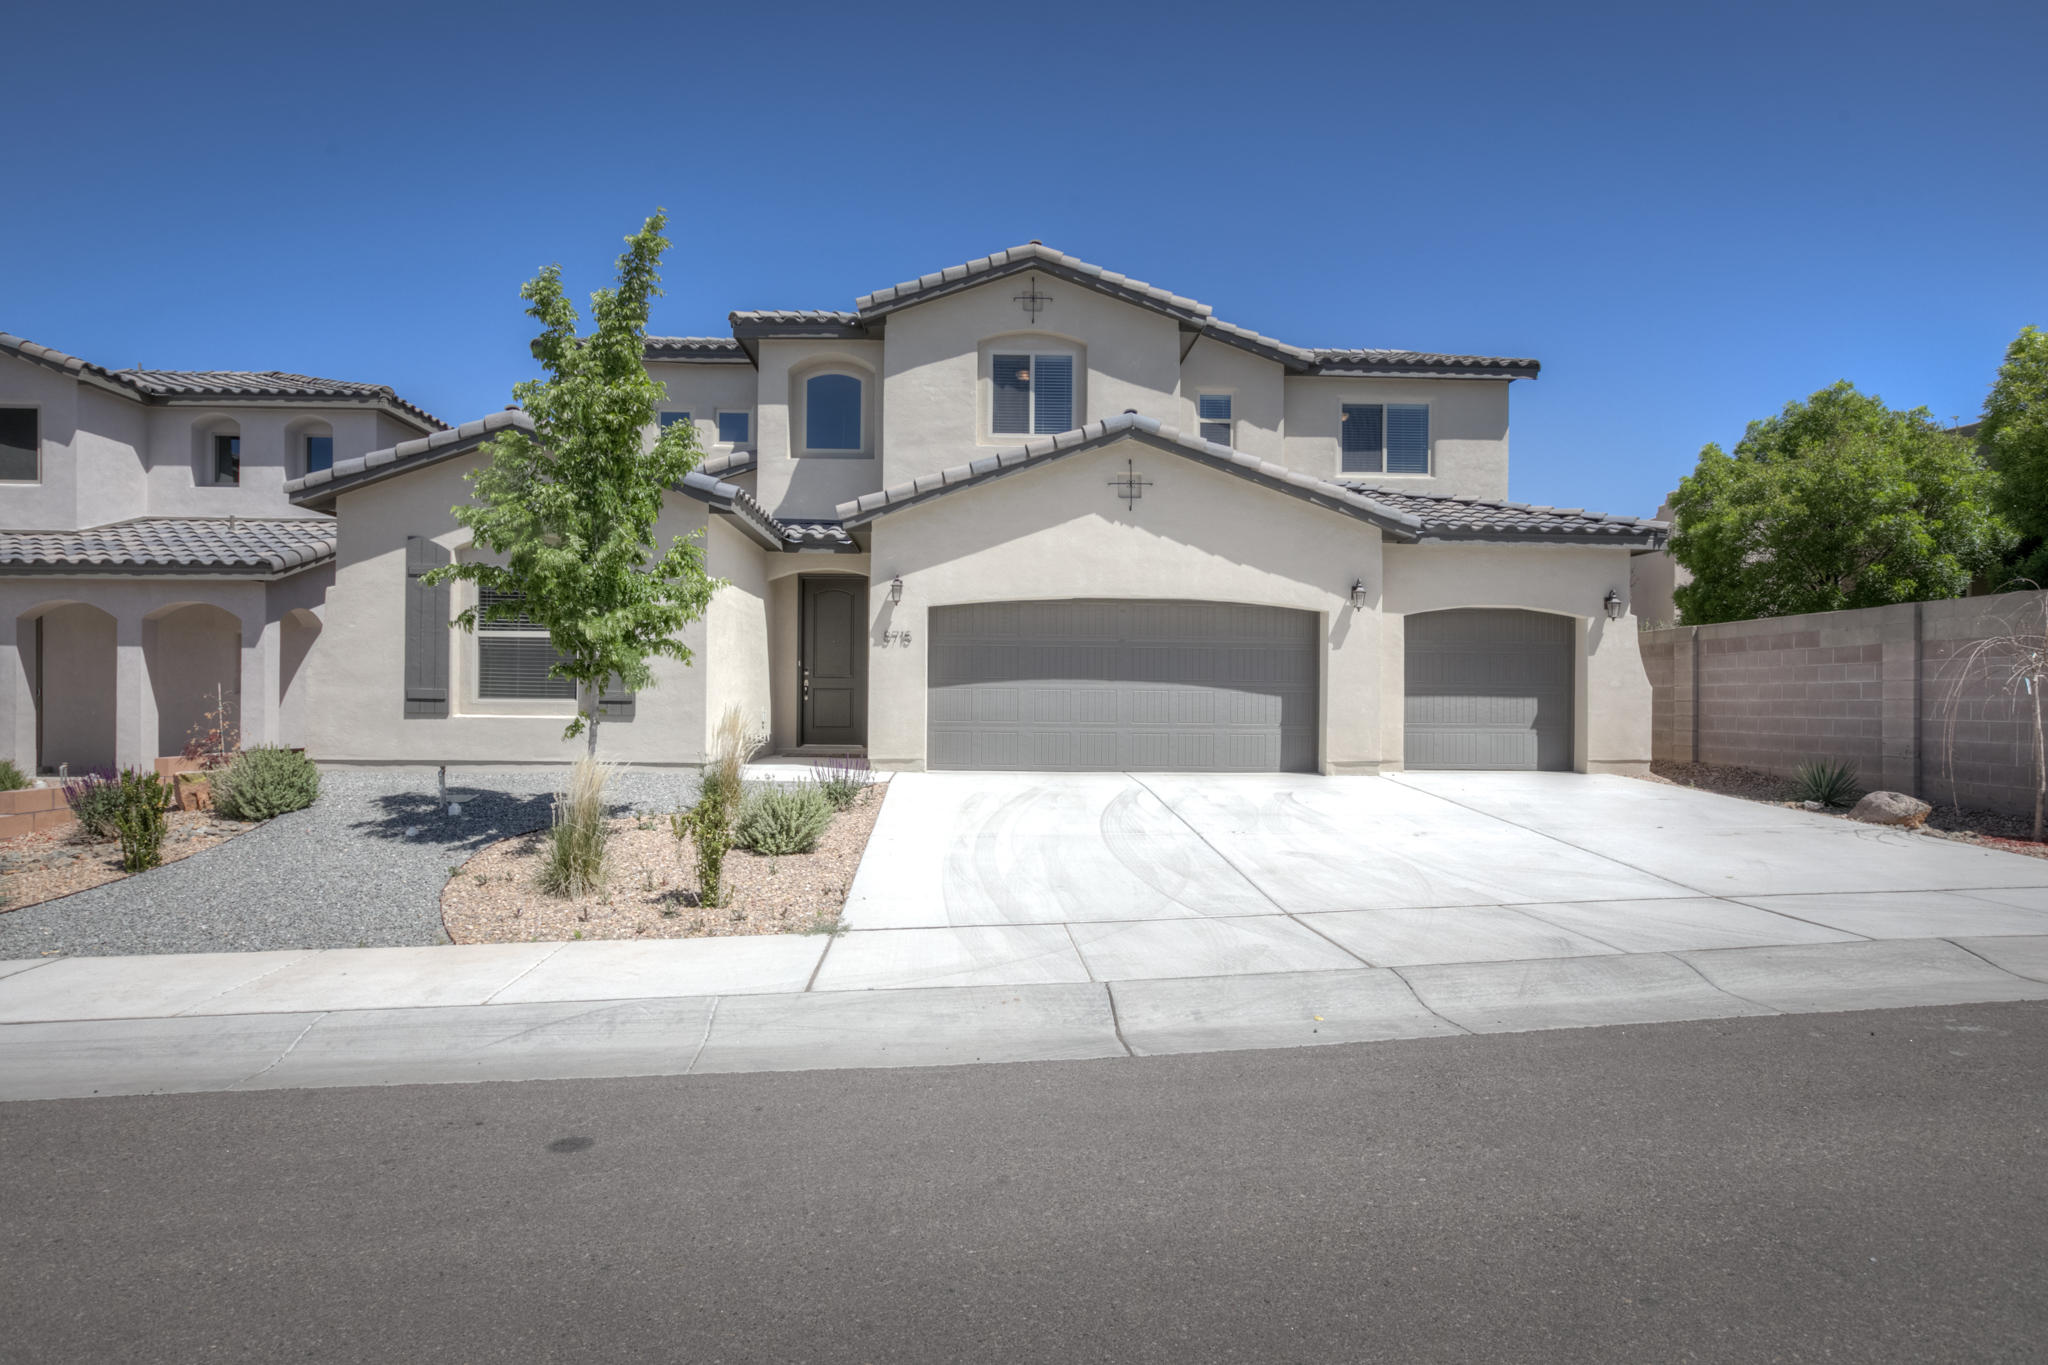 8715 DESERT FINCH Lane NE Property Photo - Albuquerque, NM real estate listing